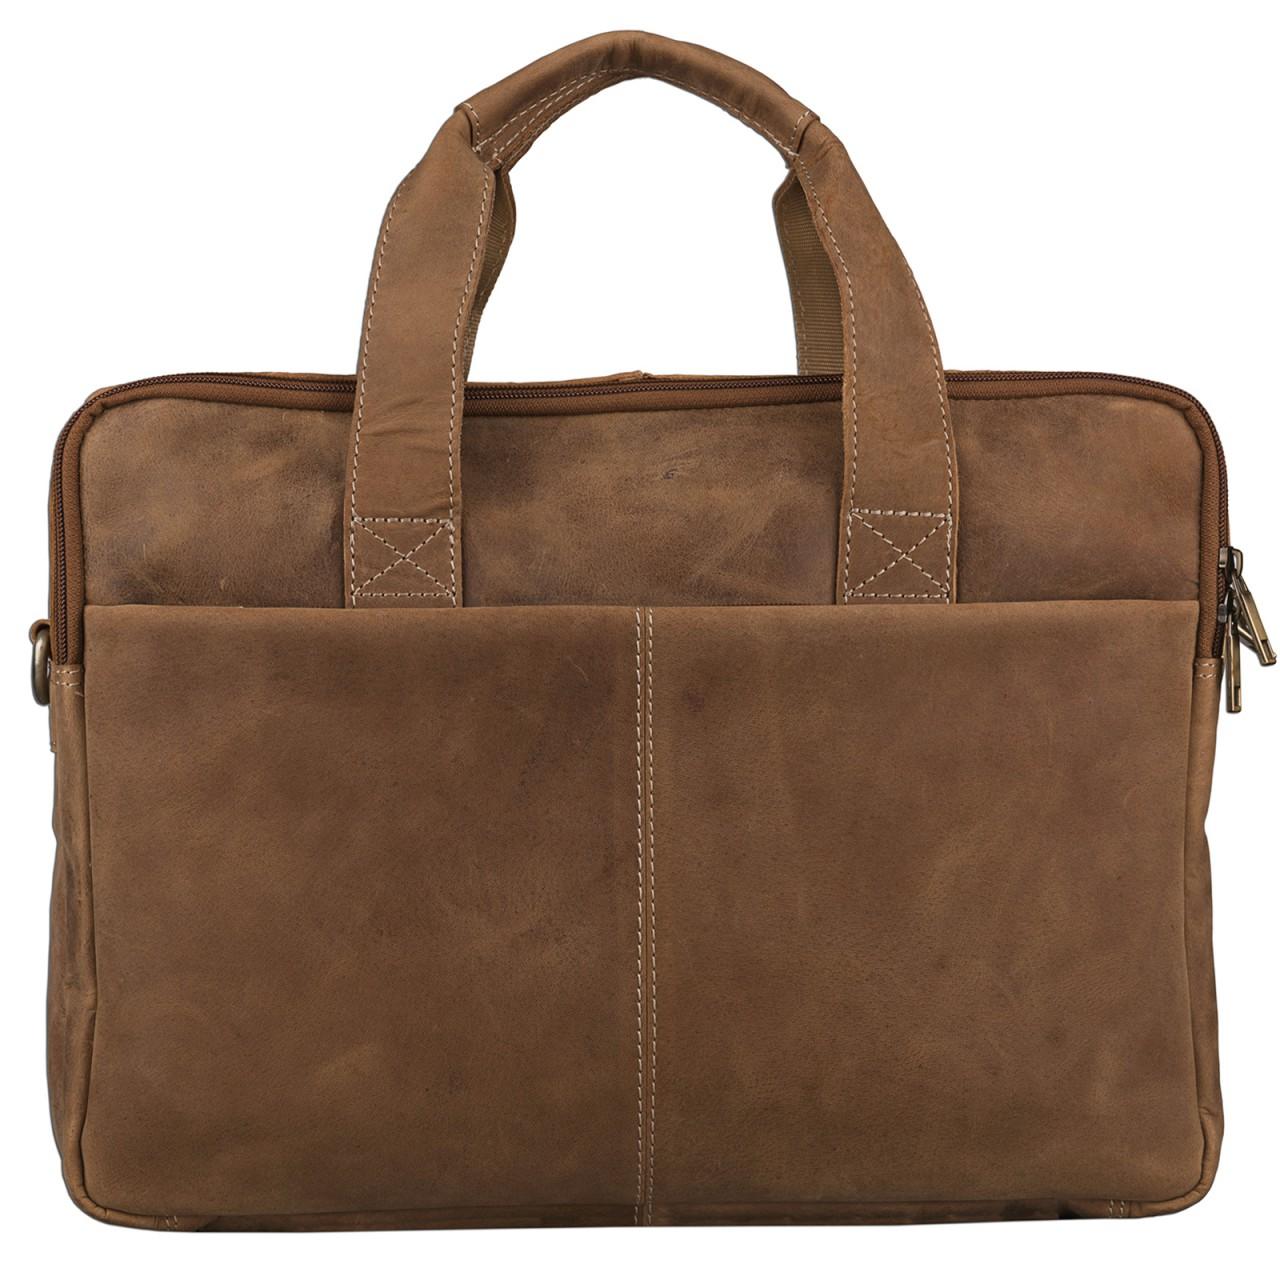 STILORD Vintage Herren Umhängetasche Leder groß Ledertasche Büro Business Studium Uni Lehrertasche Tabletfach 12 Zoll echtes Rinds Leder Braun - Bild 6